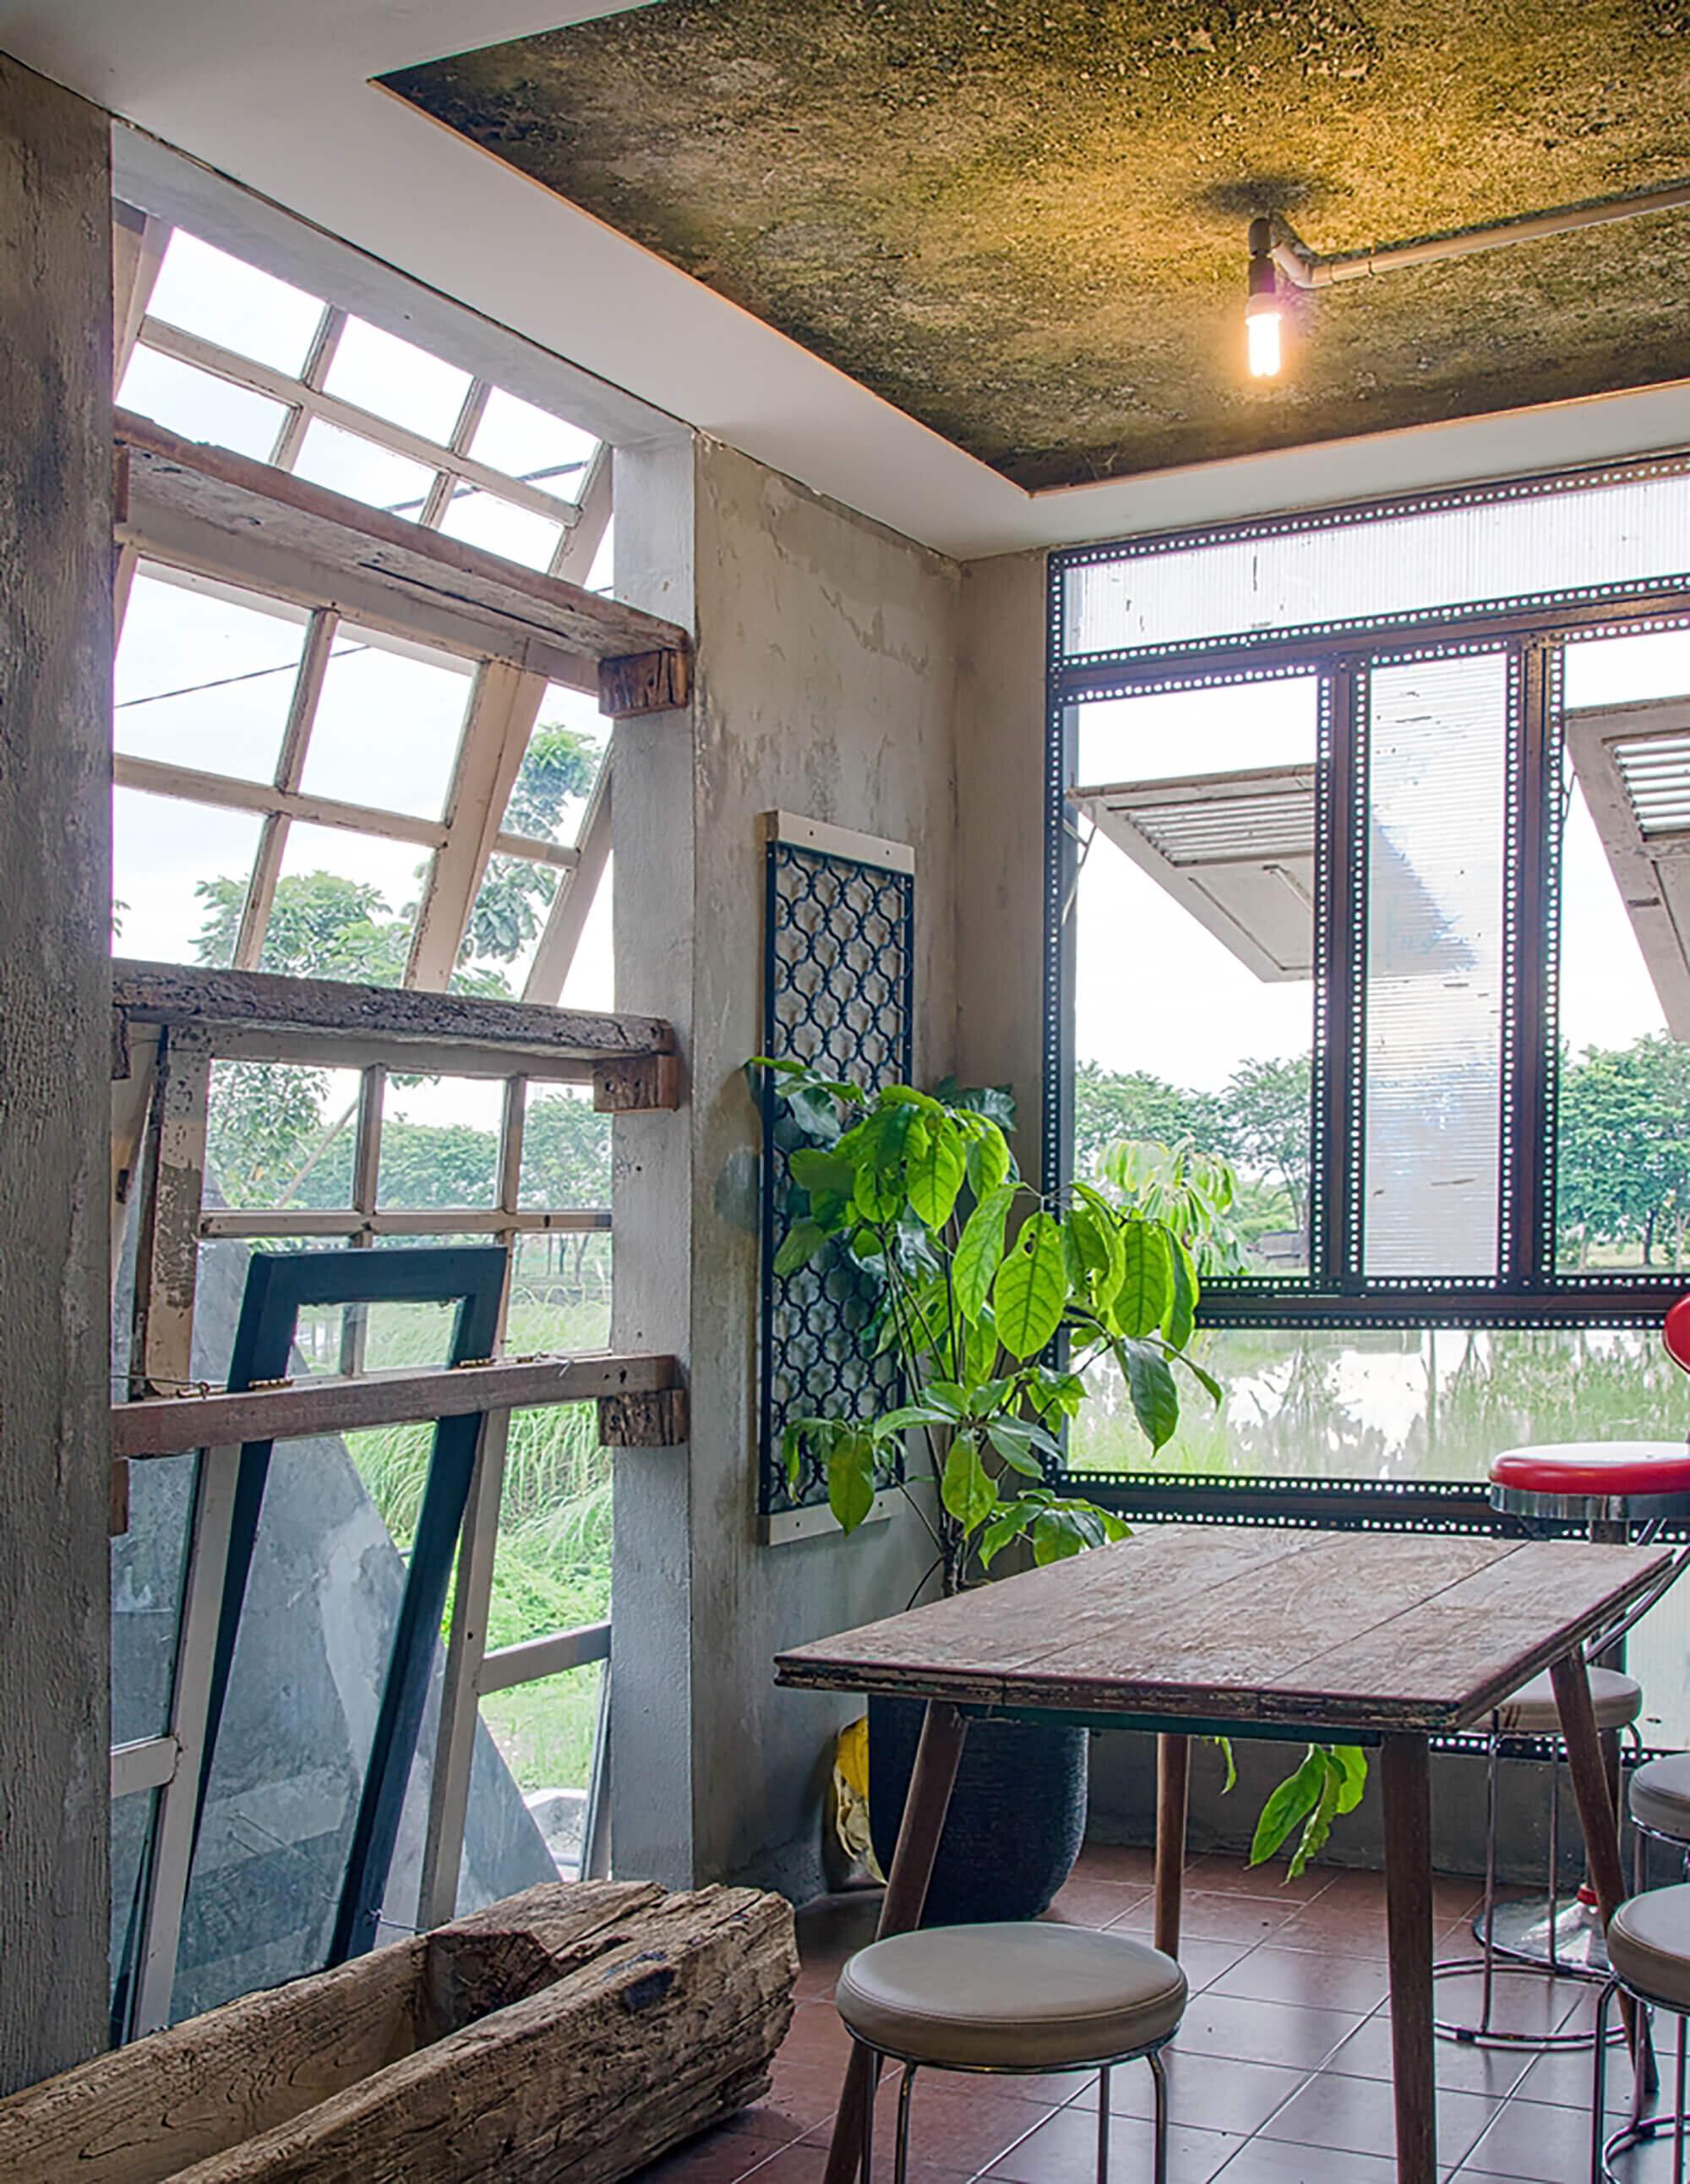 The-Obsolete-House-Omah-Amoh-Gayuh-Budi-Utomo-Indonesia-28